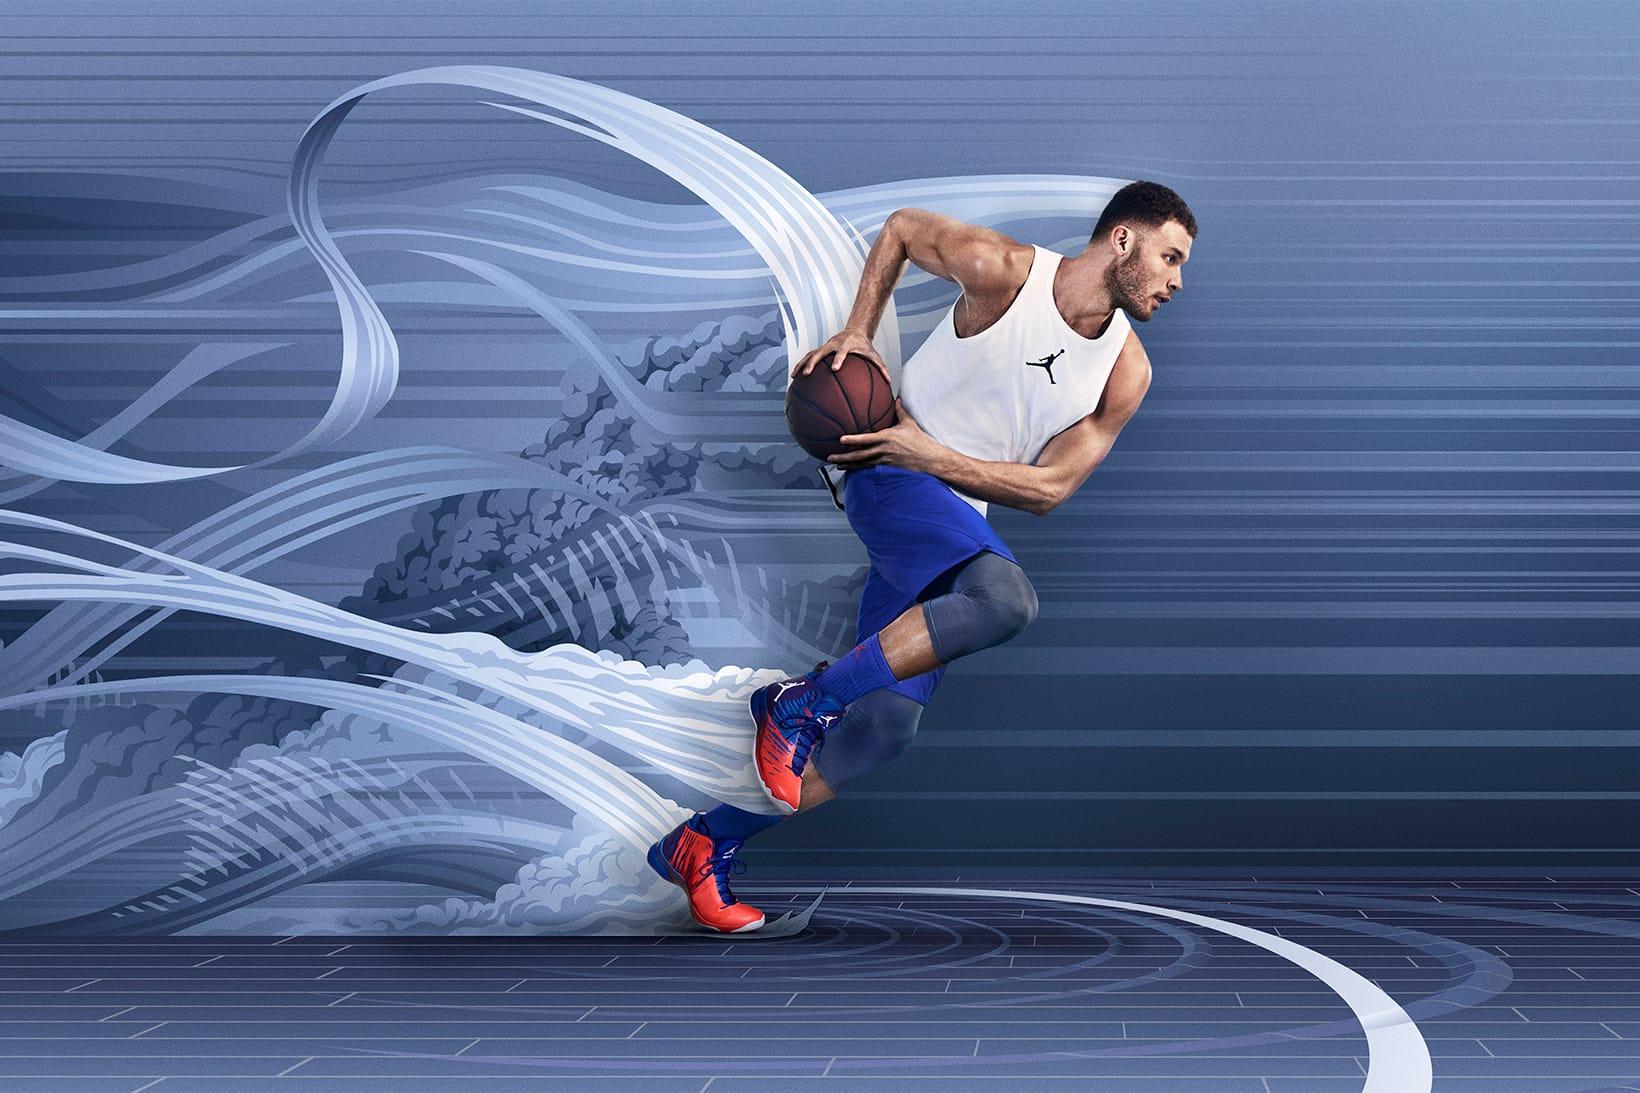 Blake Griffin's Jordan Super.Fly 5